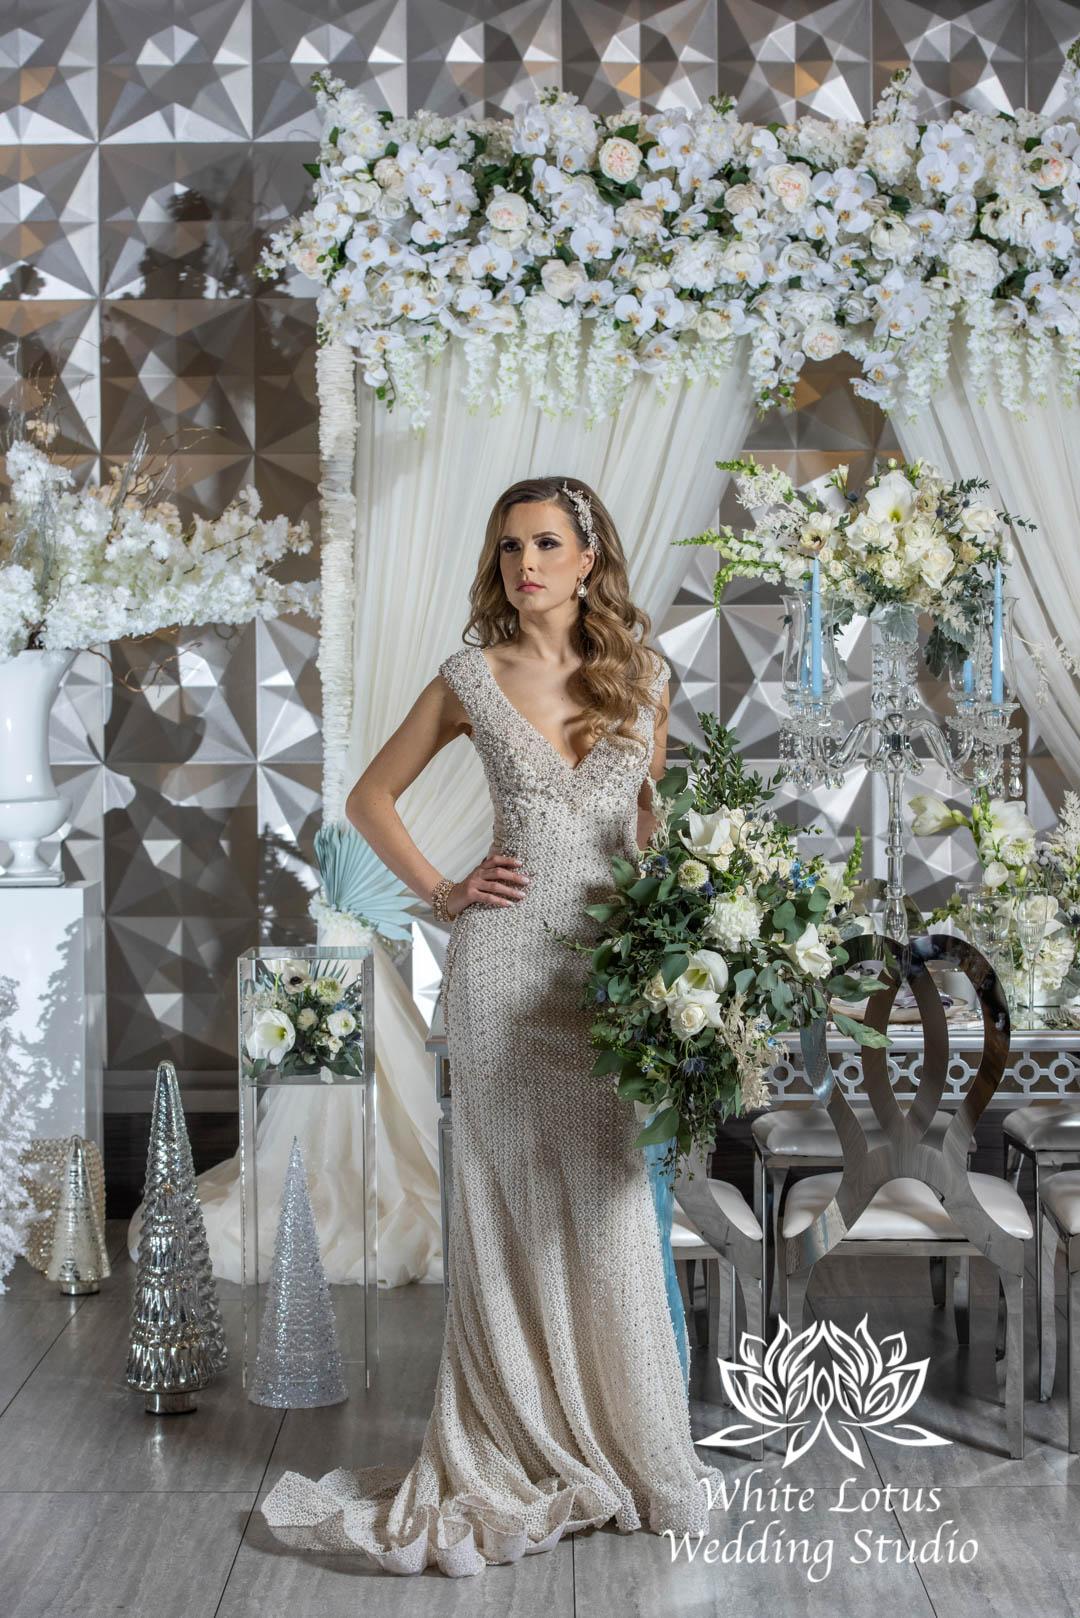 153- GLAM WINTERLUXE WEDDING INSPIRATION